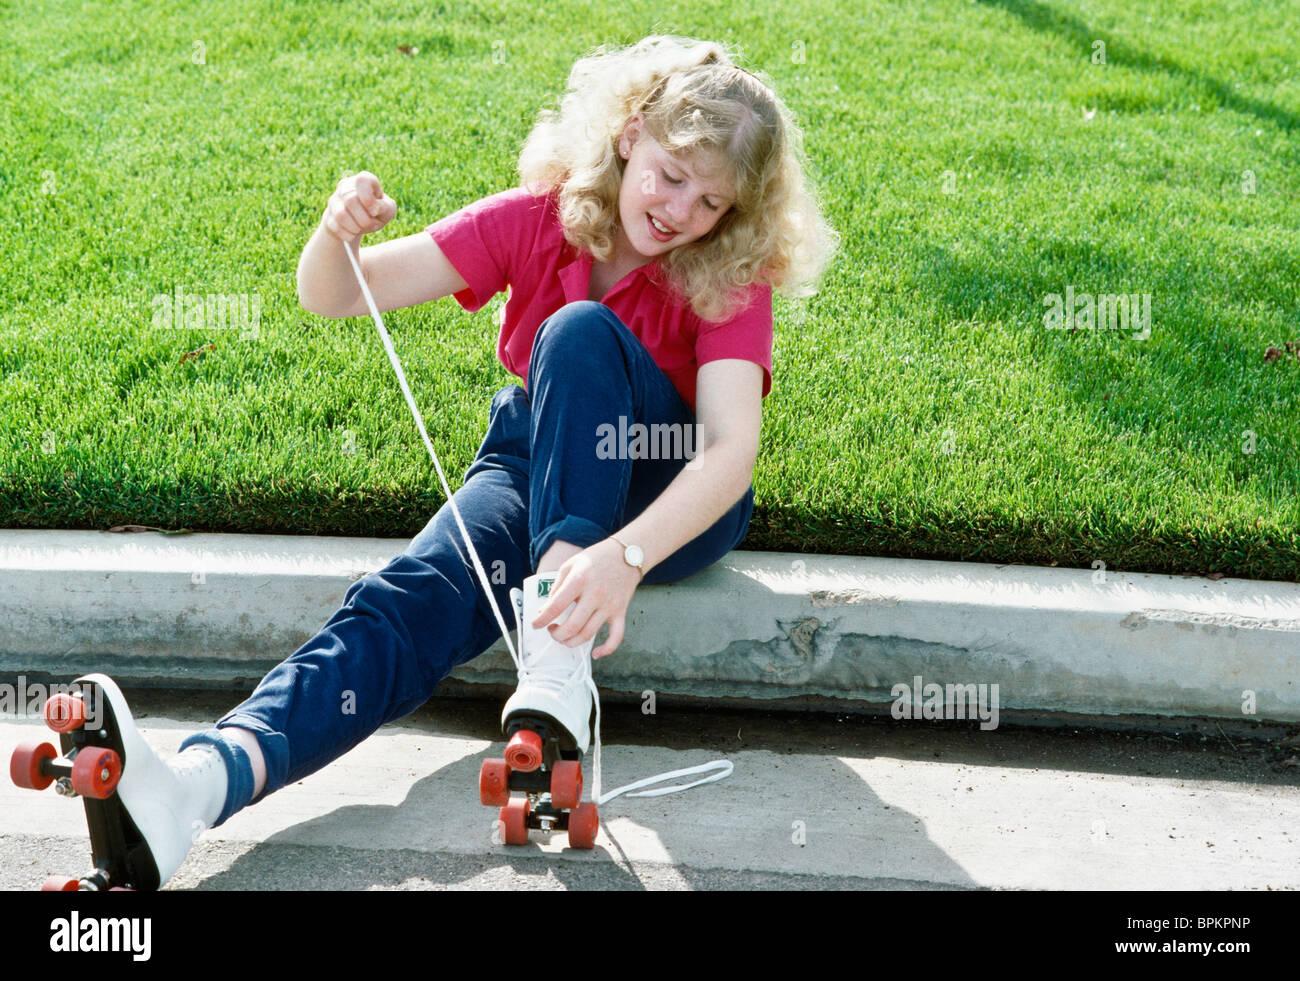 Roller skates winnipeg - Teenage Girl Lacing Up Roller Skates Stock Image